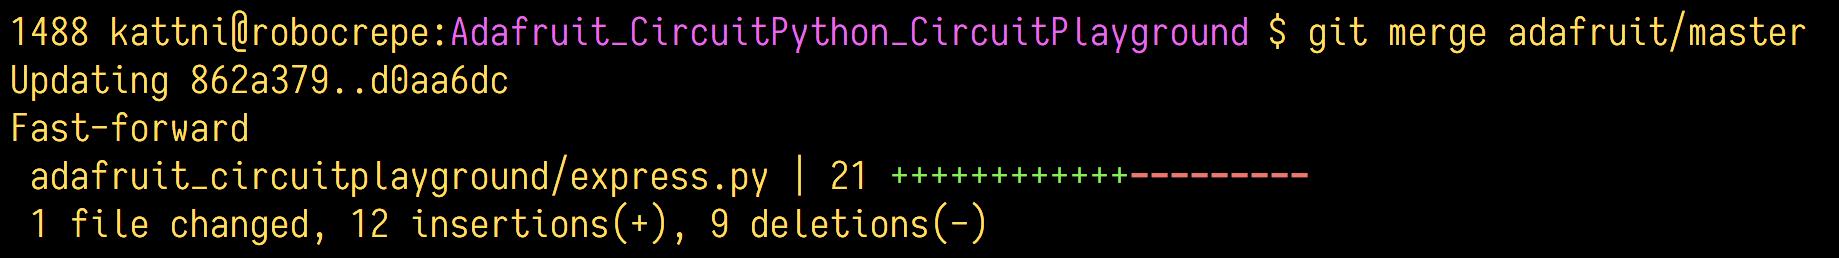 circuitpython_GitUpdateGitMergeAdafruitMaster.png